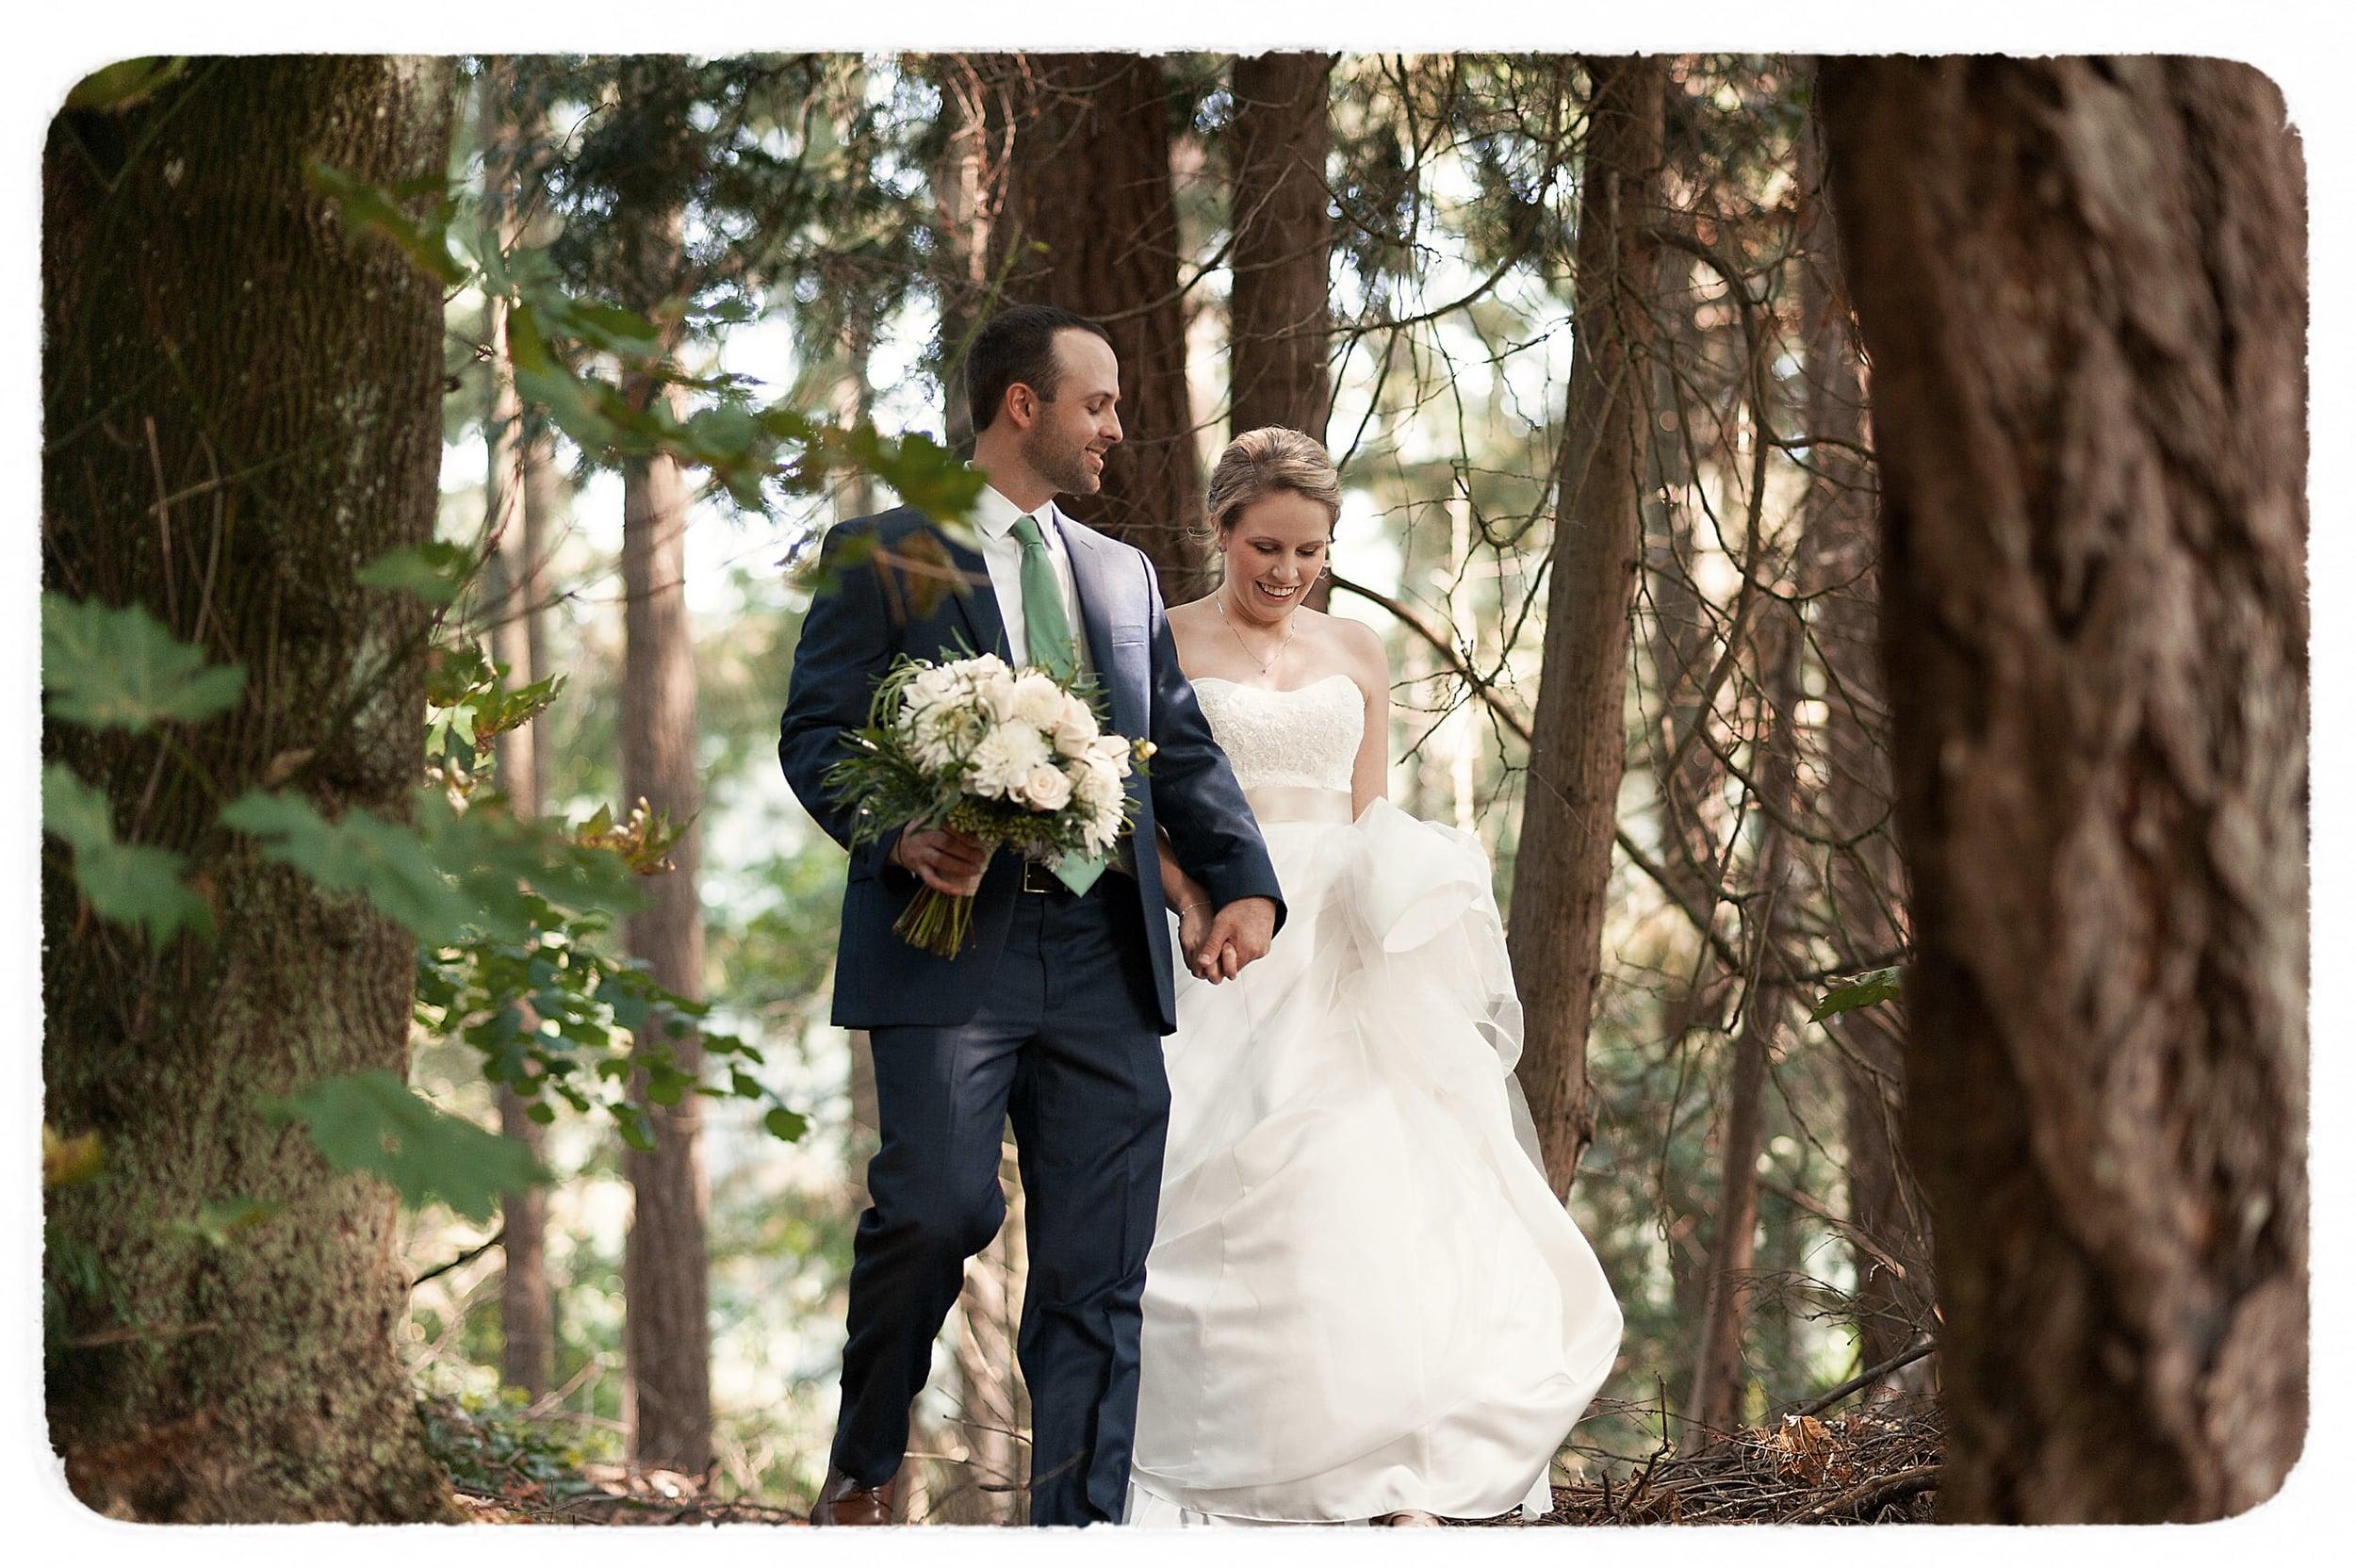 91 Kate&Marc-Wedding-OriginalCollection-91Film.jpg